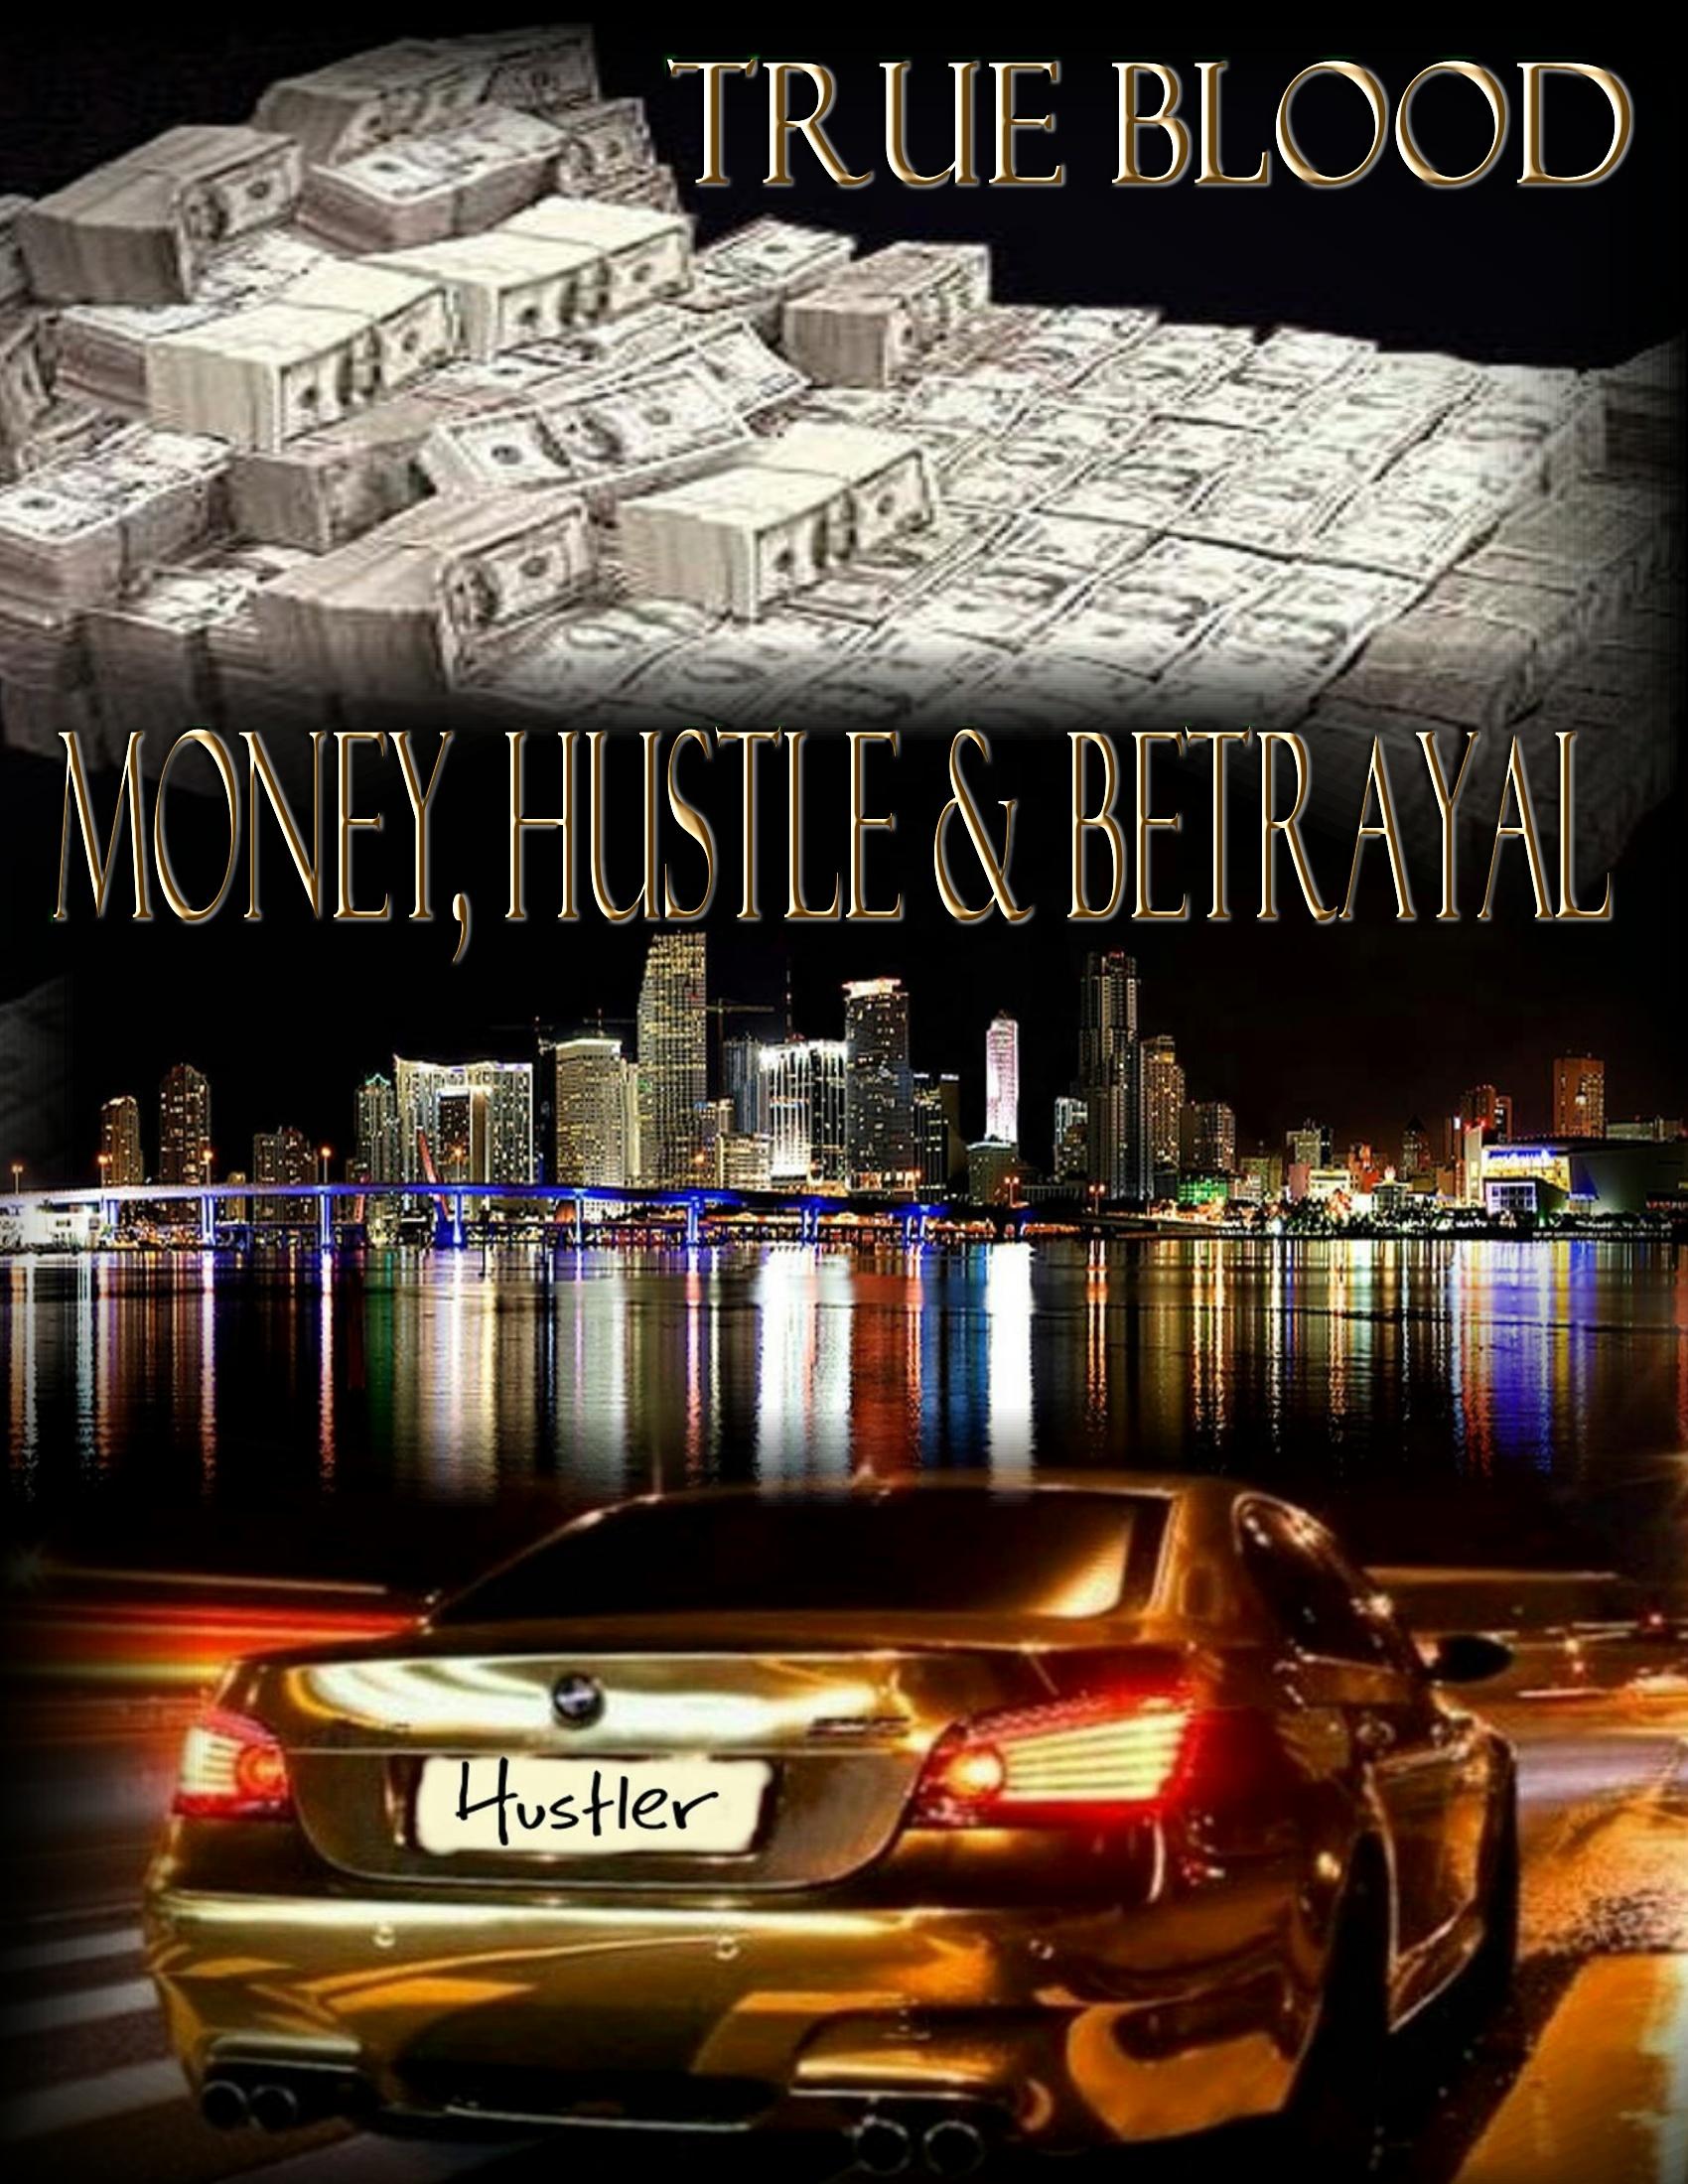 Money, Hustle, & Betrayal